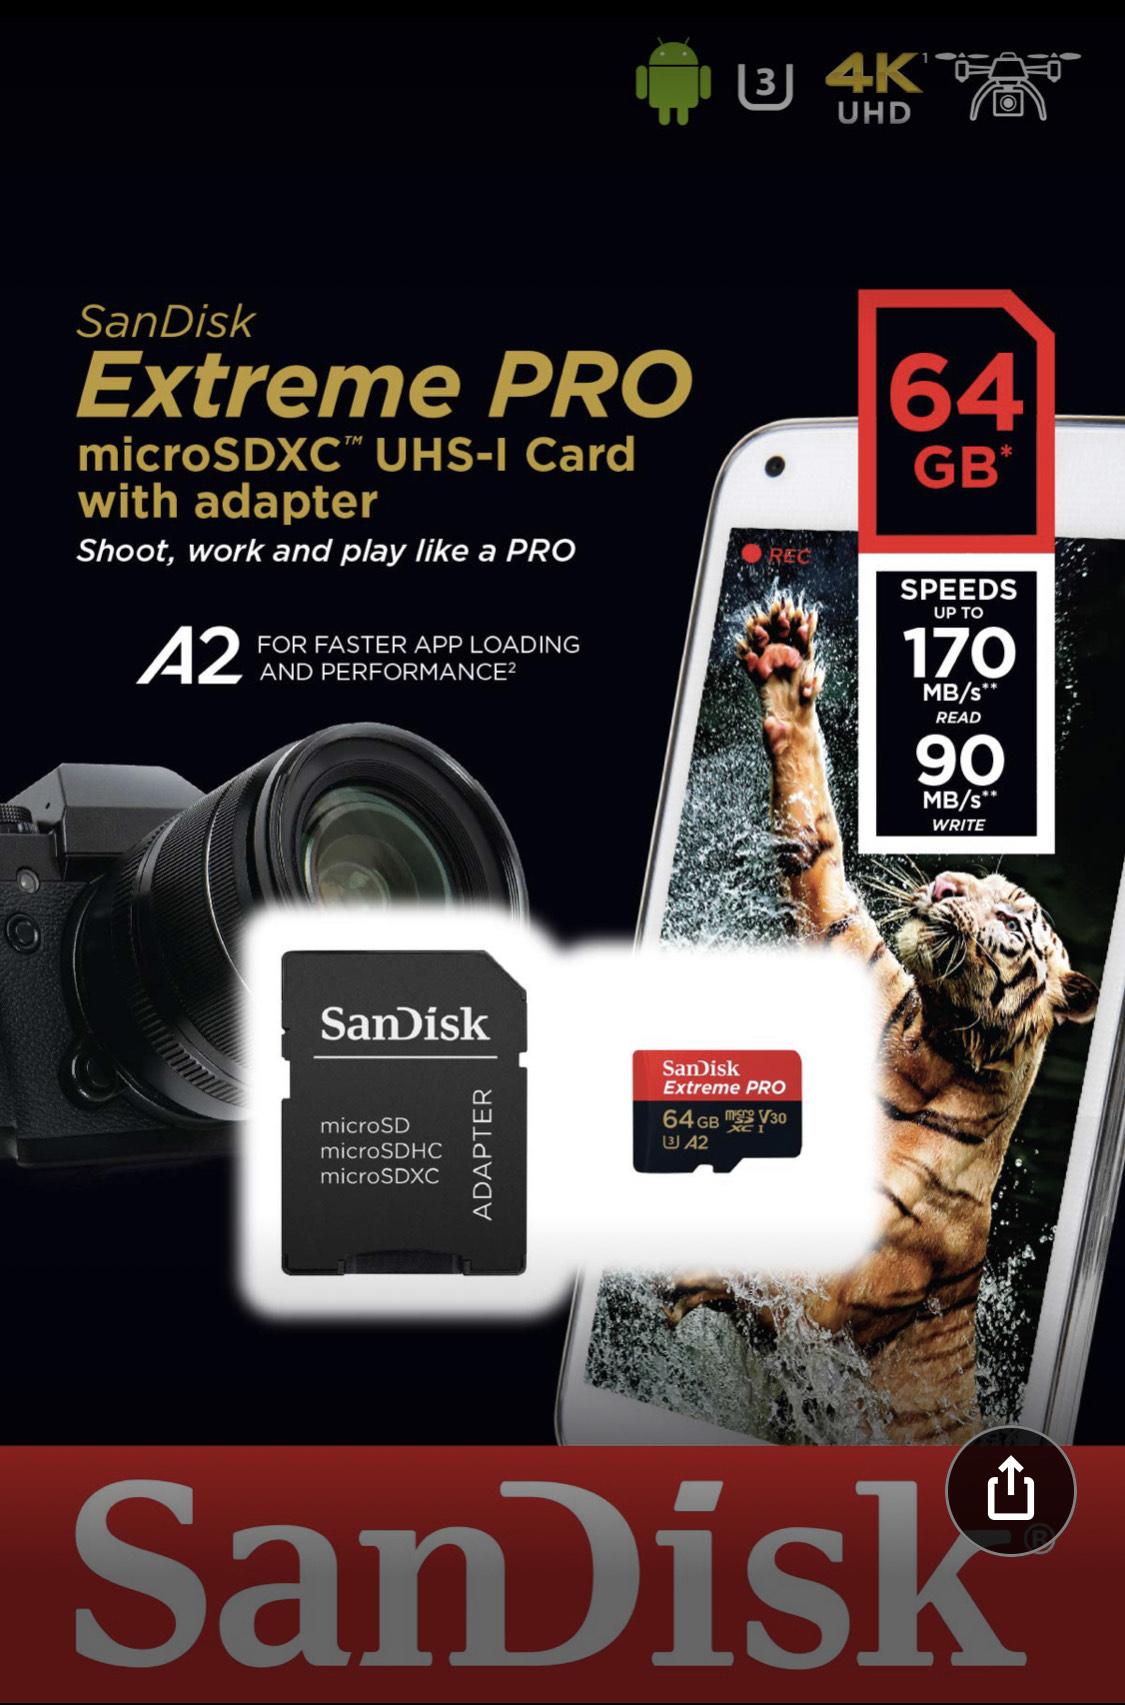 SanDisk Extreme PRO 64gb